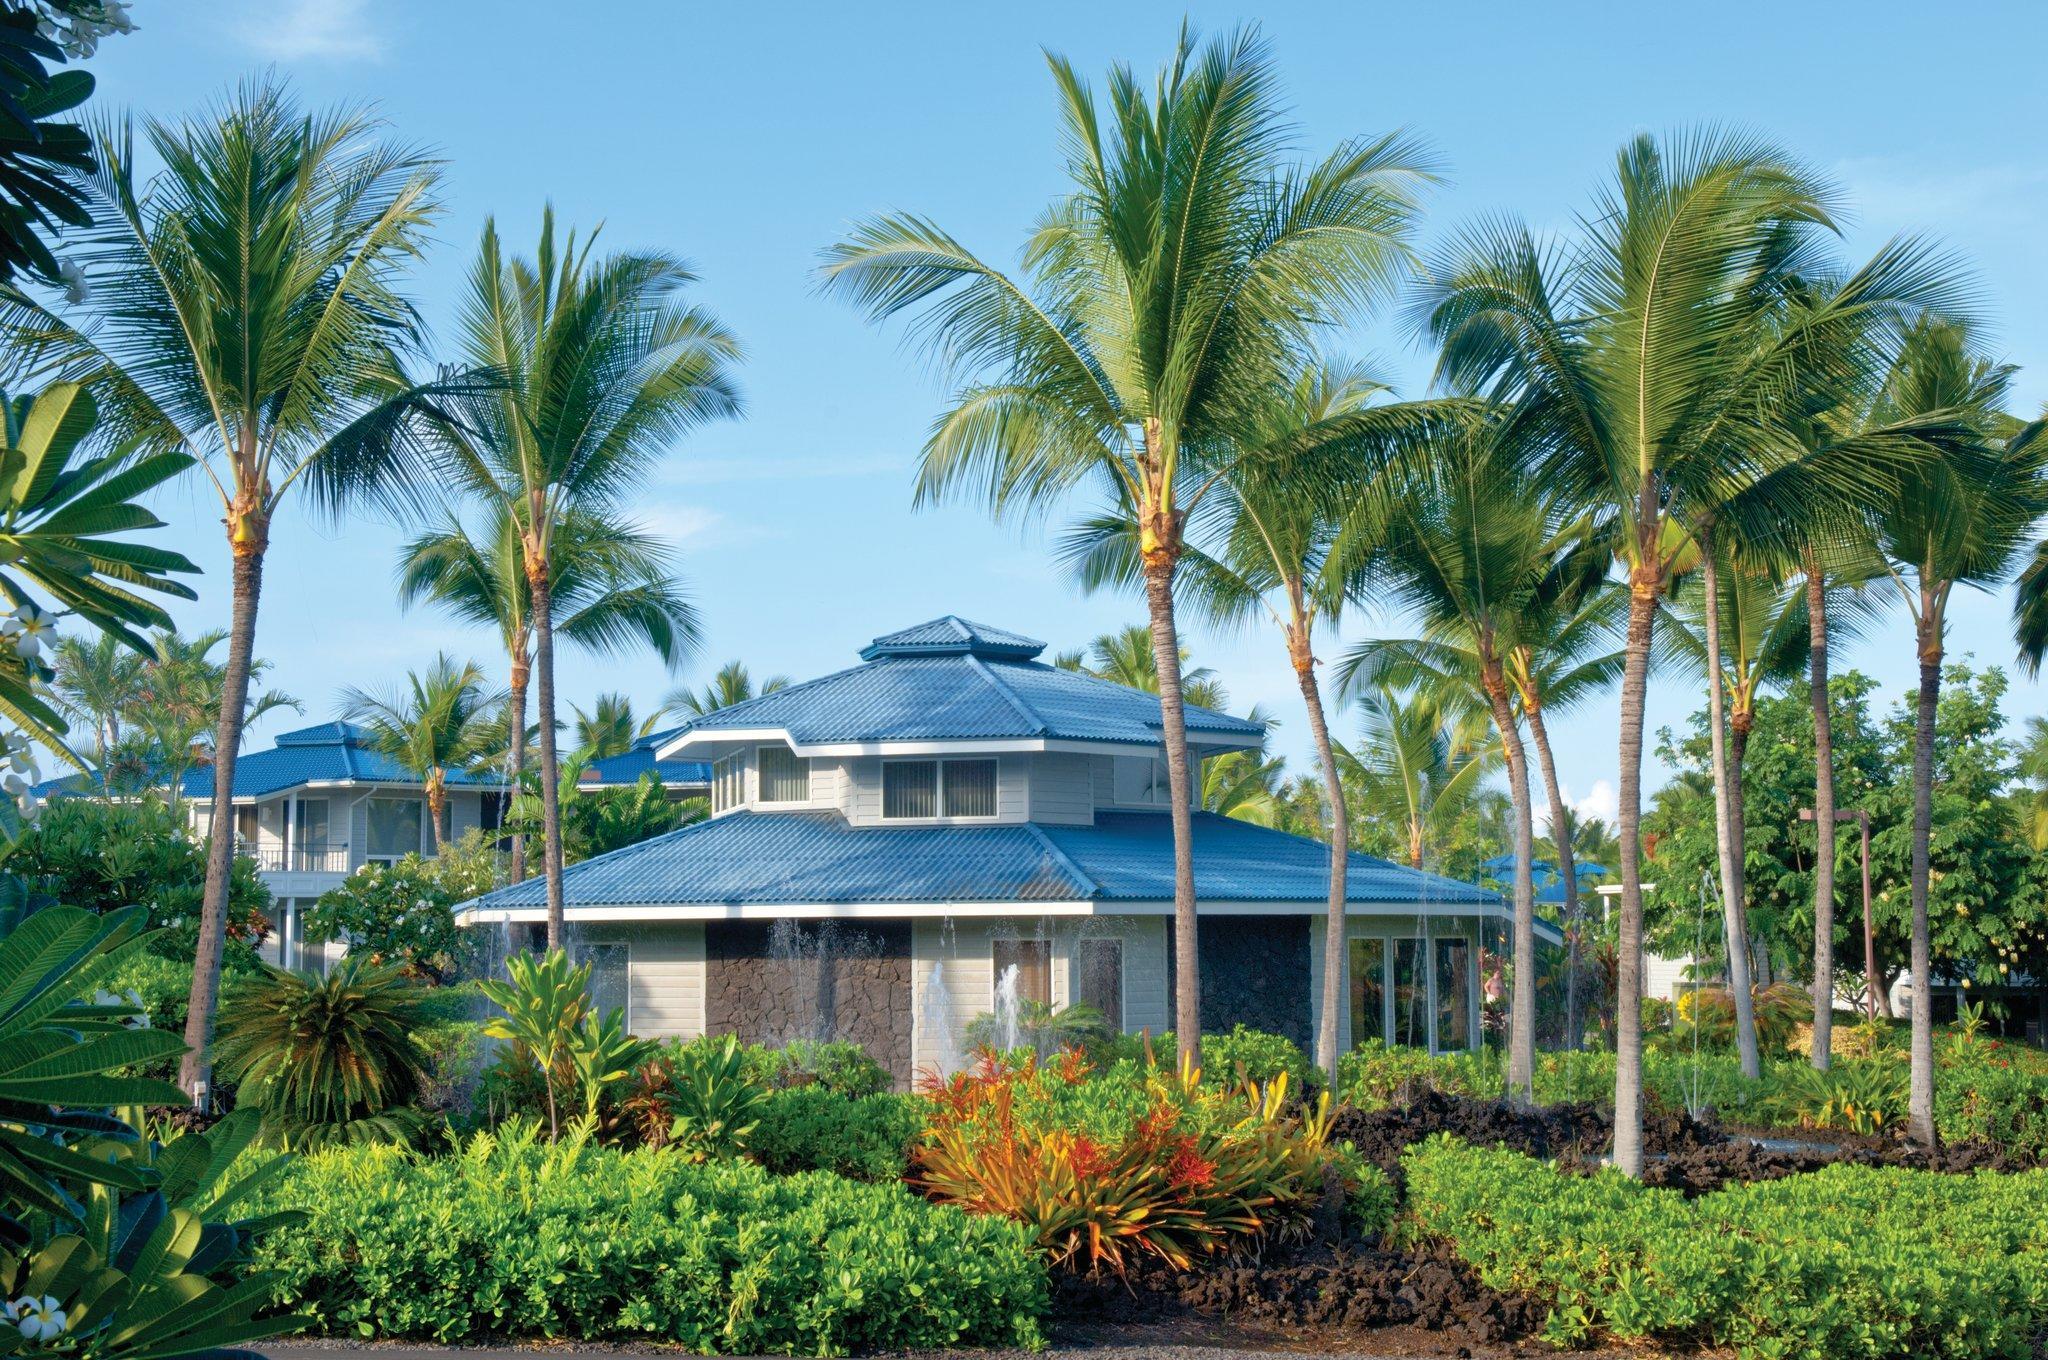 Wyndham Mauna Loa Village image 0